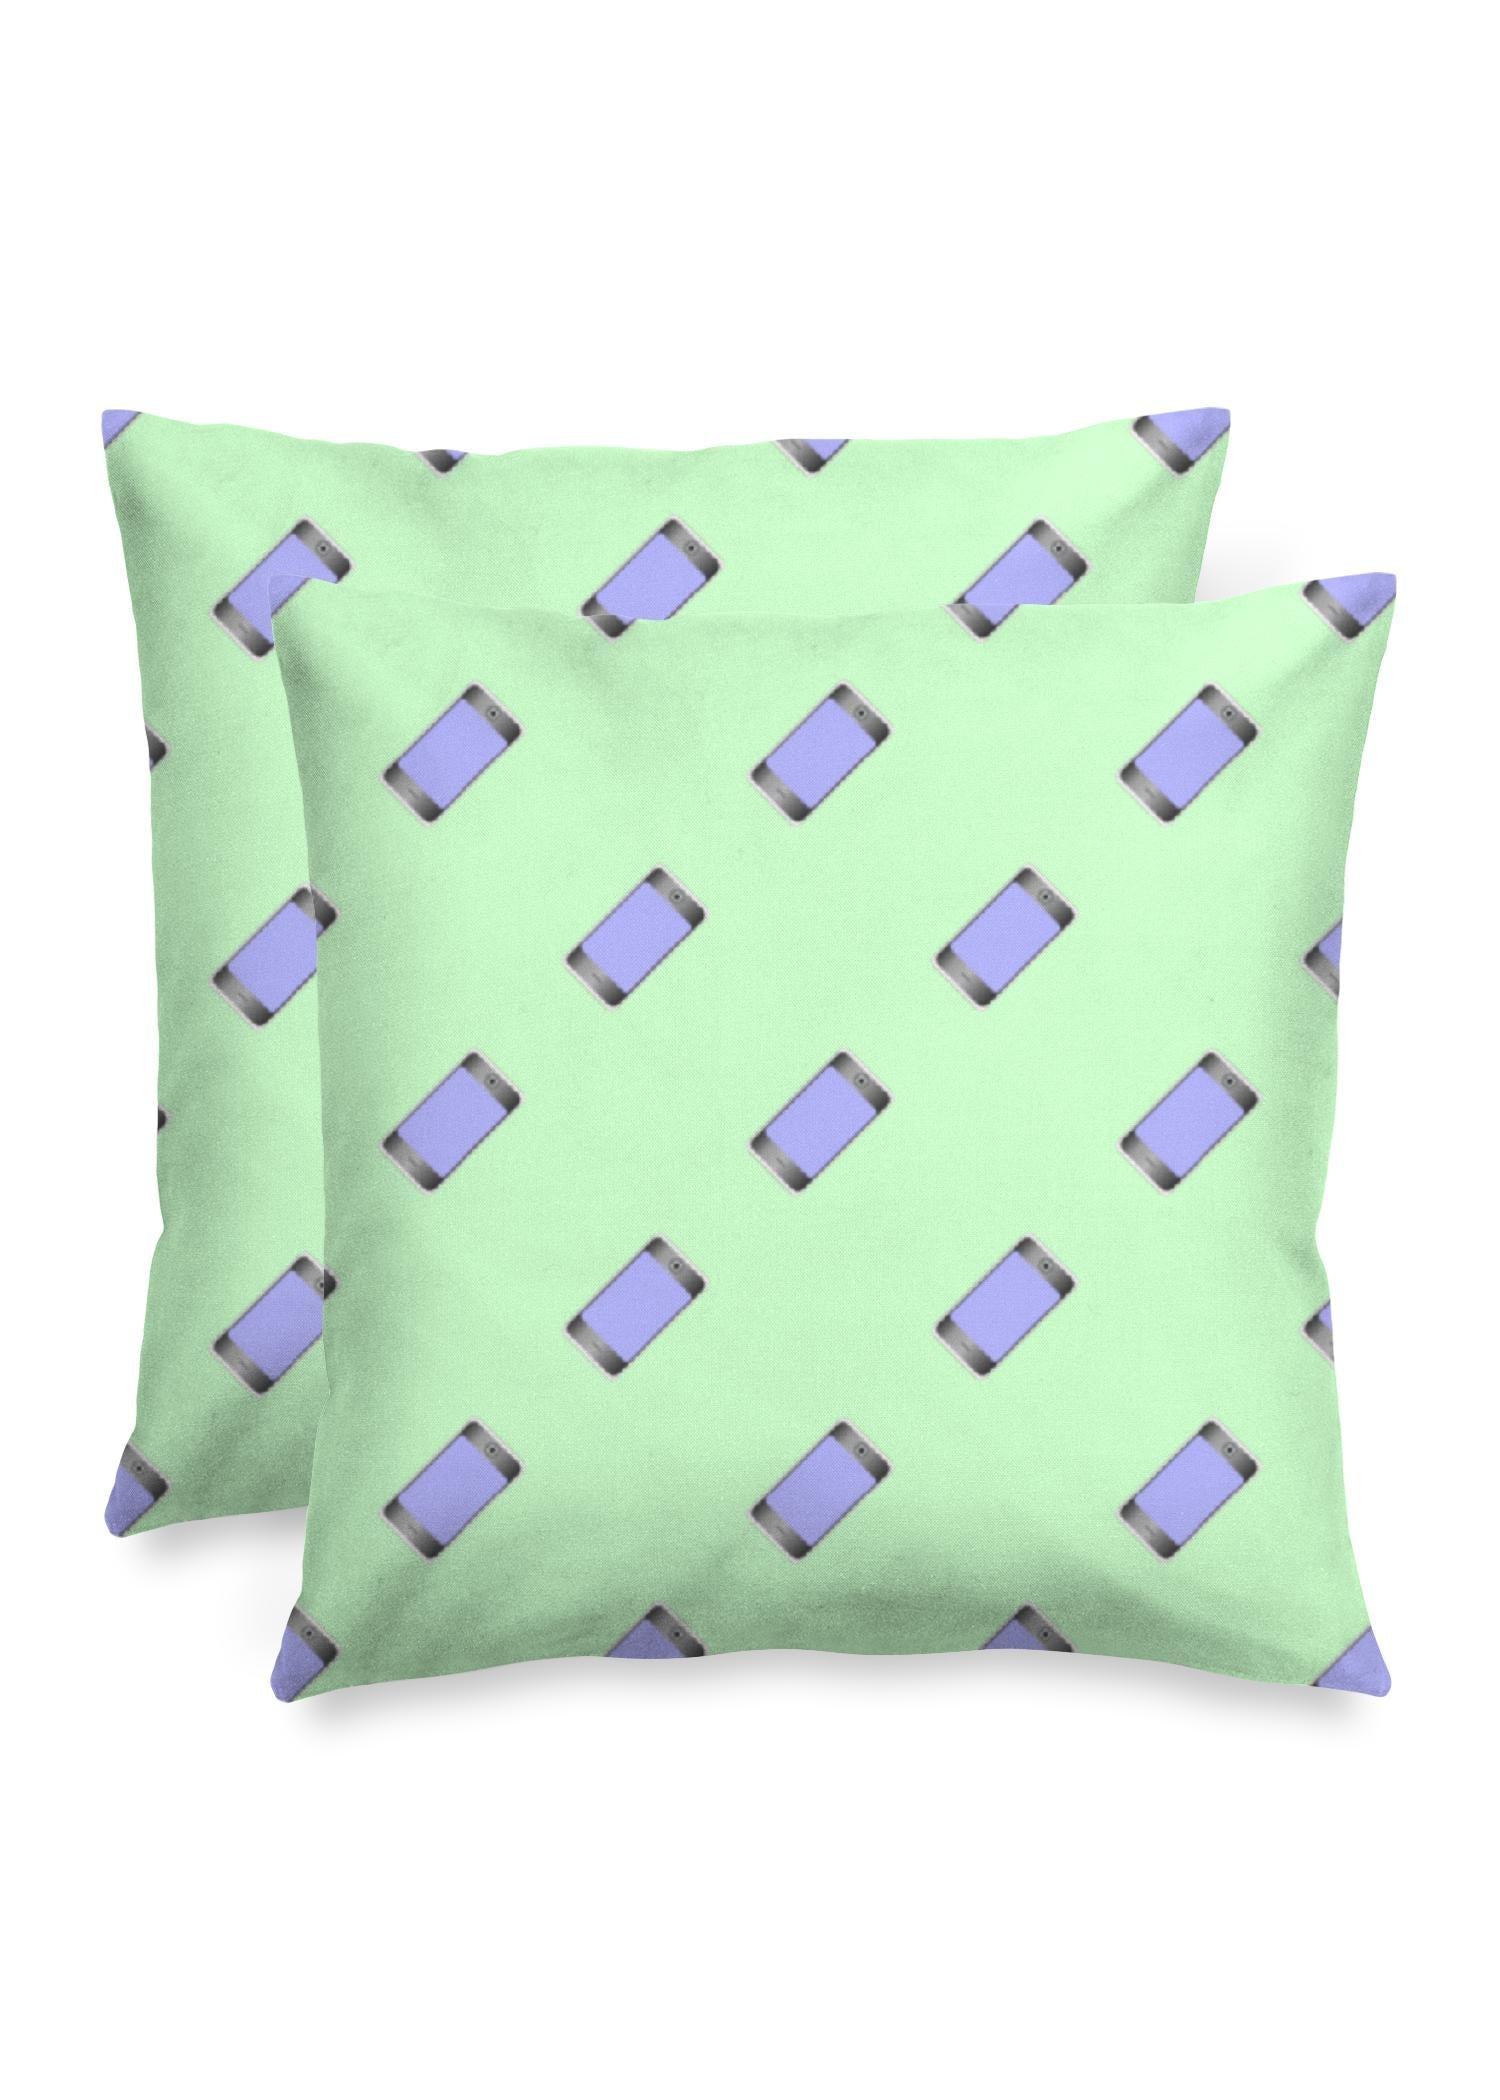 "VIDA Square Pillow - Mobile Phones On Green in Green by VIDA Original Artist  - Size: Luster / 20"" / Single"